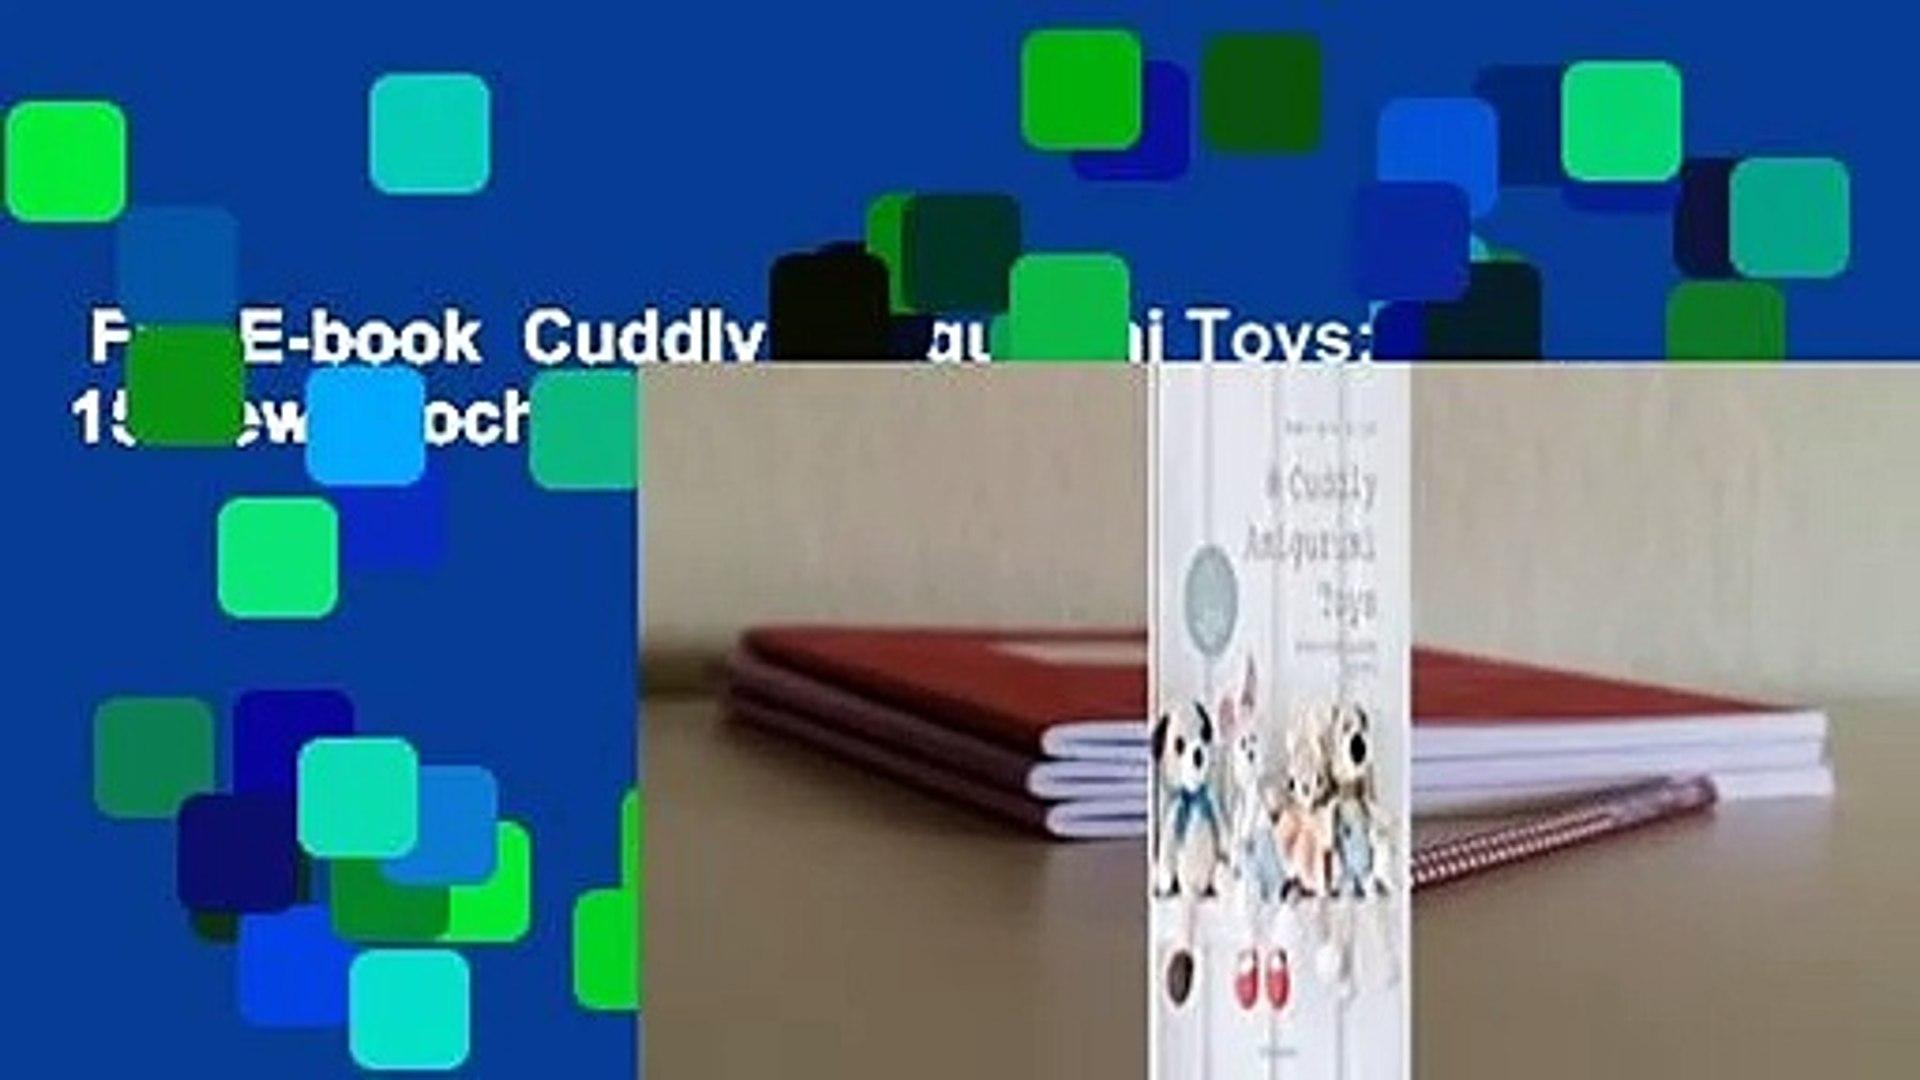 Cuddly Amigurumi Toys: 15 New Crochet Projects by Lilleliis ...   1080x1920